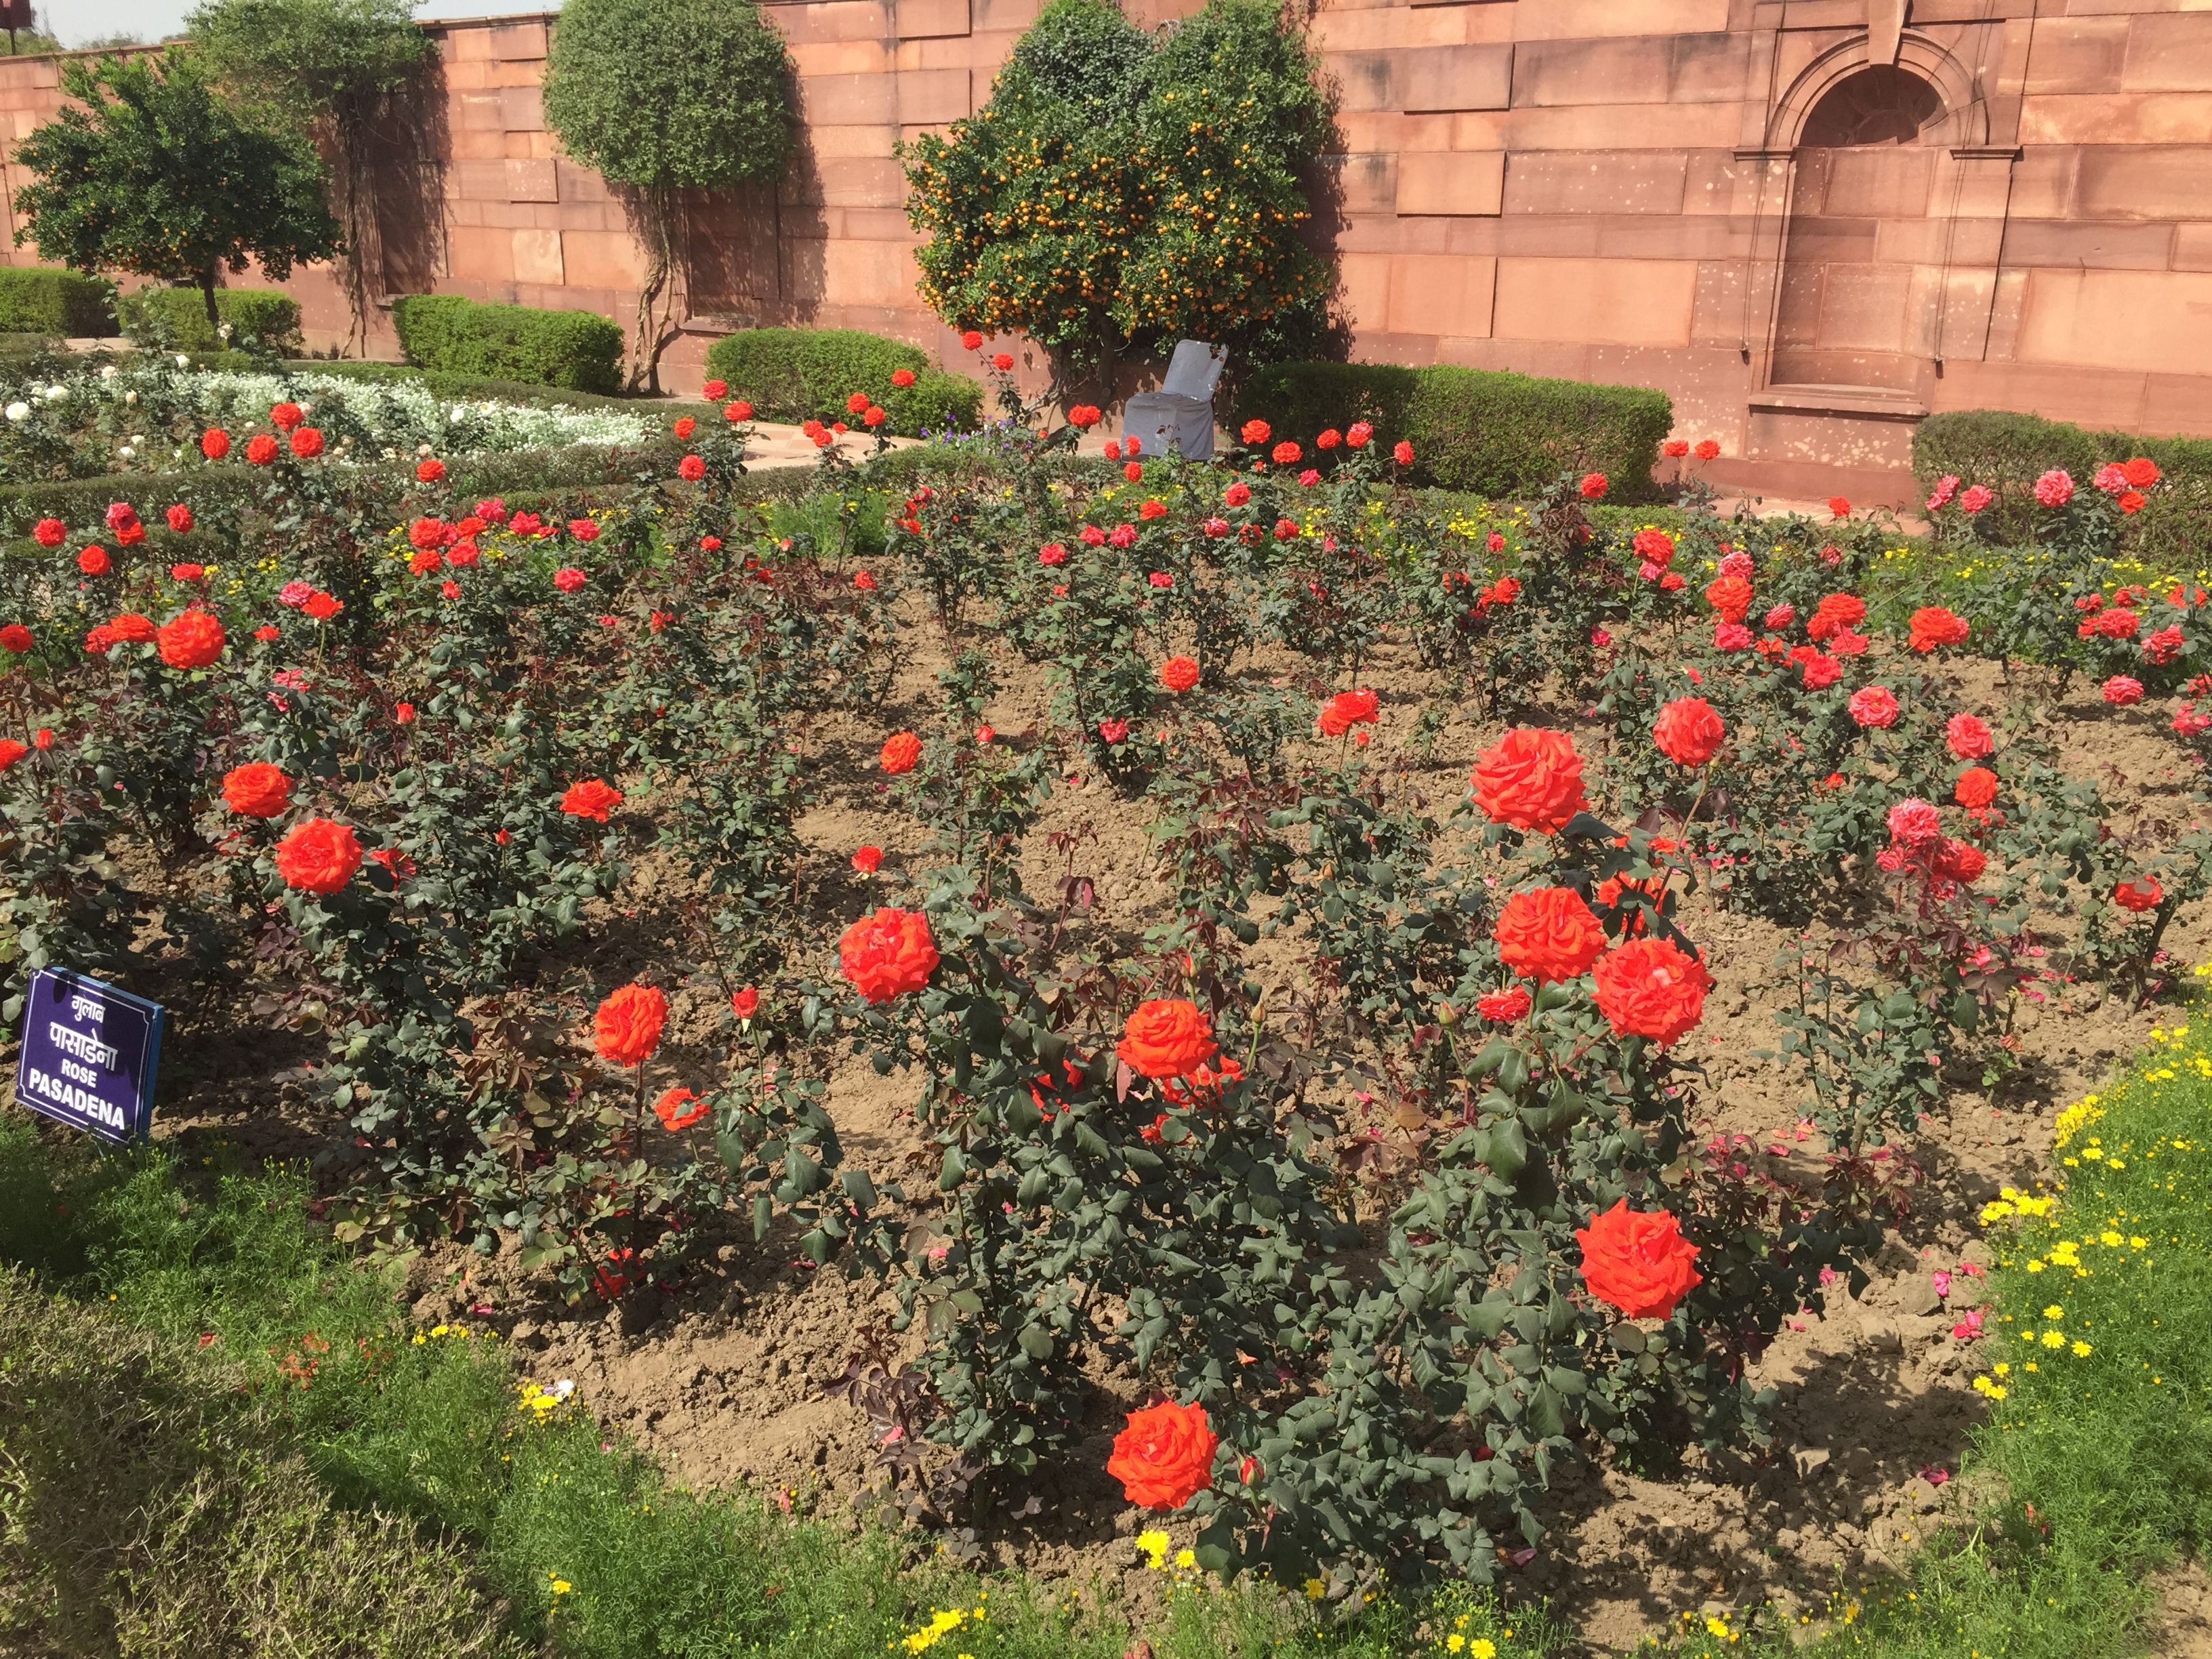 Delhi Mughal Gardens details – A Few Good Things